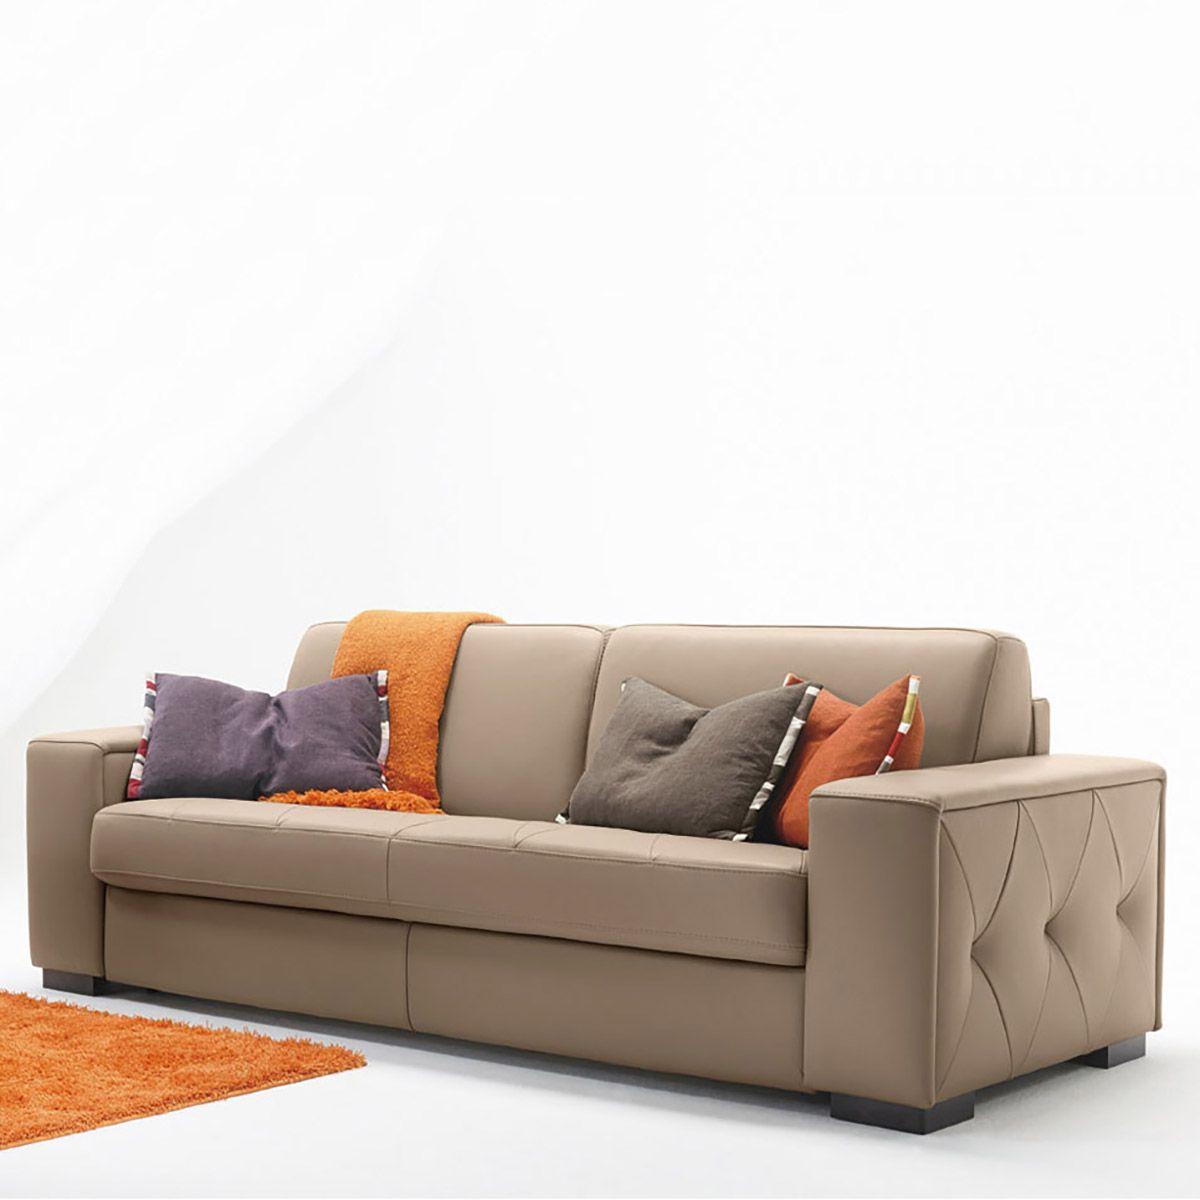 Positano Design Depot Furniture Furniture Miami Showroom With Images Sofa Frame Sofa Design Furniture